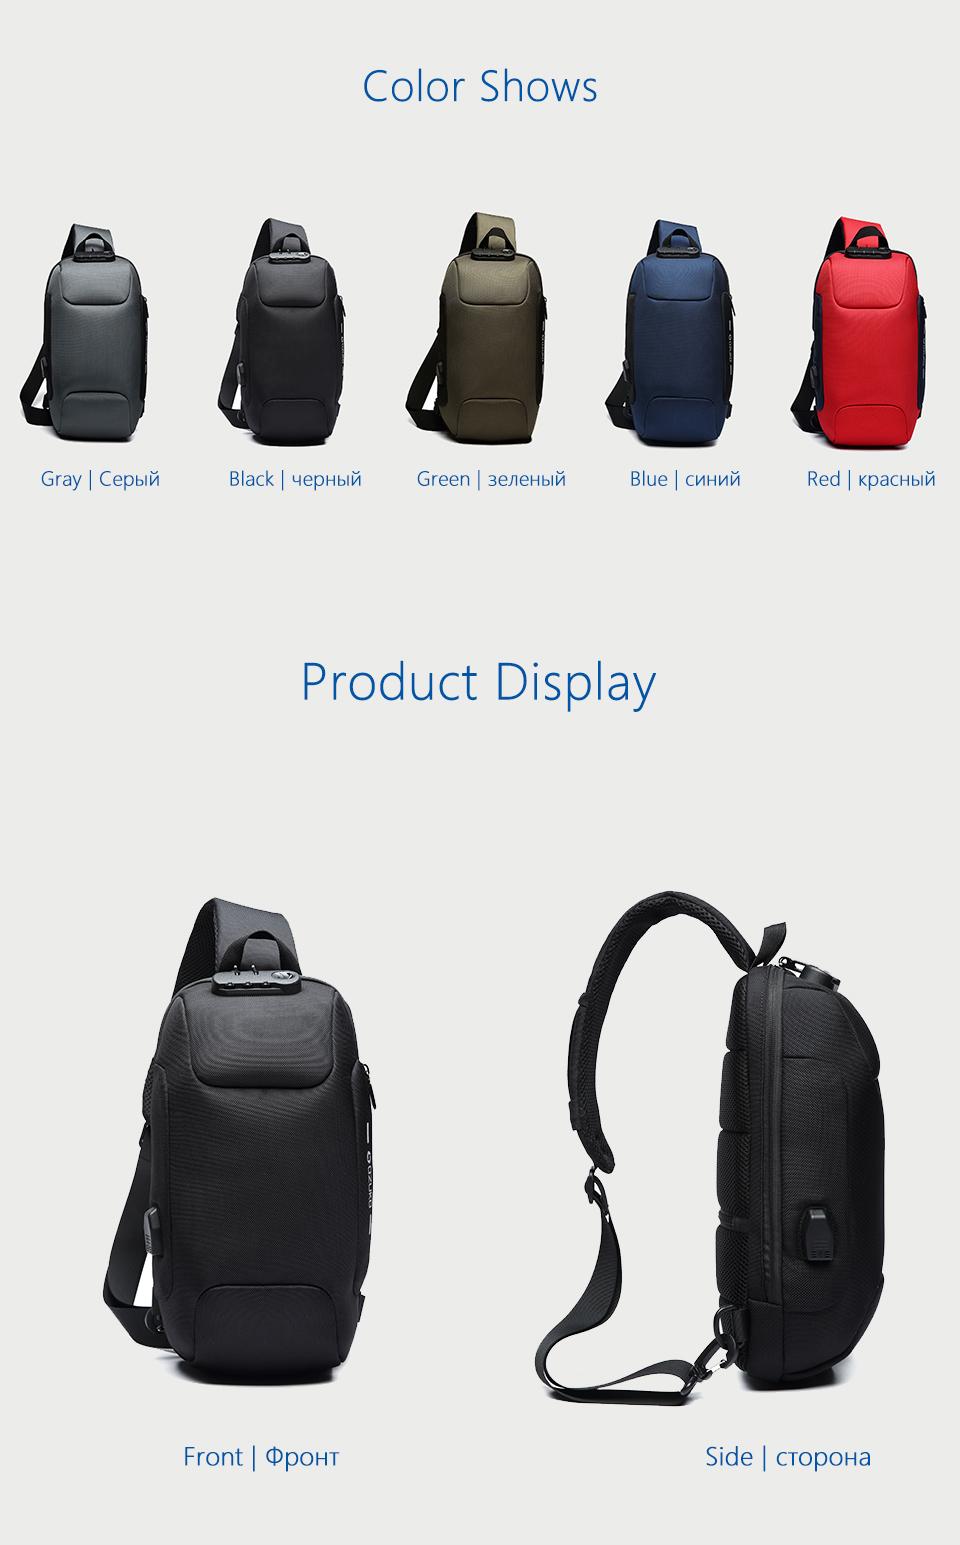 OZUKO 2019 New Multifunction Crossbody Bag for Men Anti-theft Shoulder Messenger Bags Male Waterproof Short Trip Chest Bag Pack 11